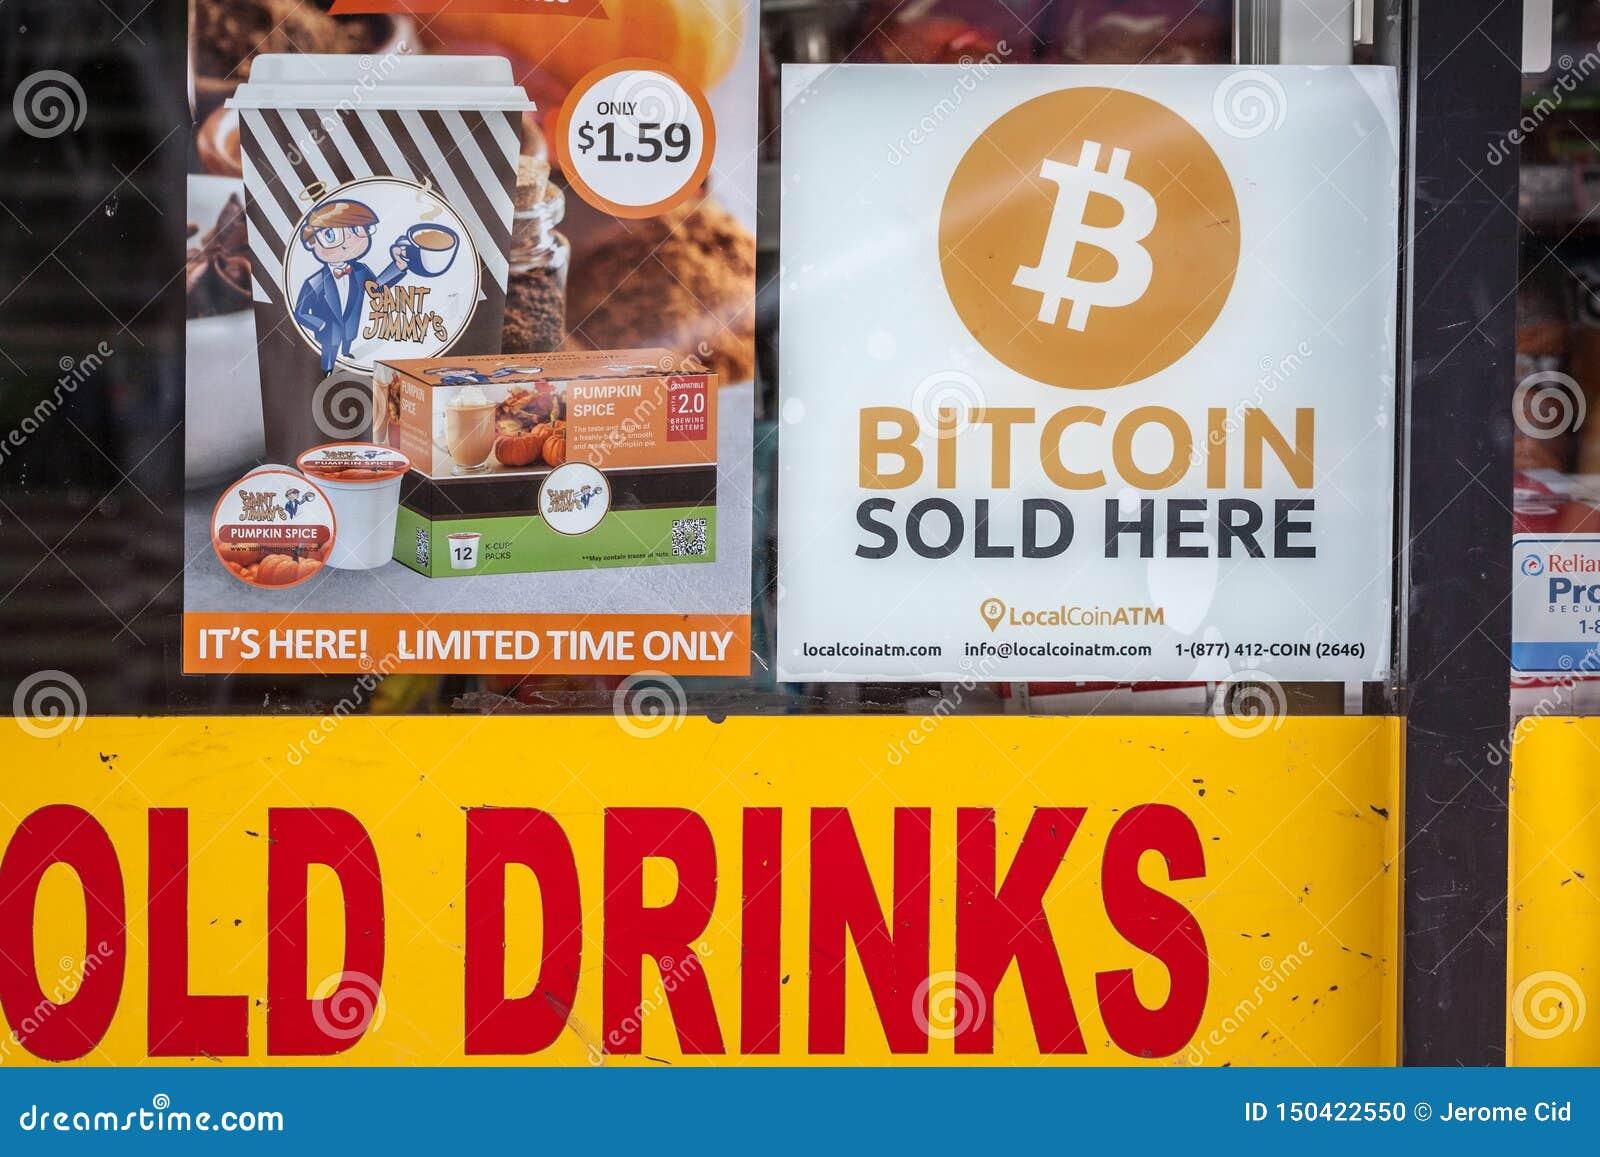 bitcoin store toronto)